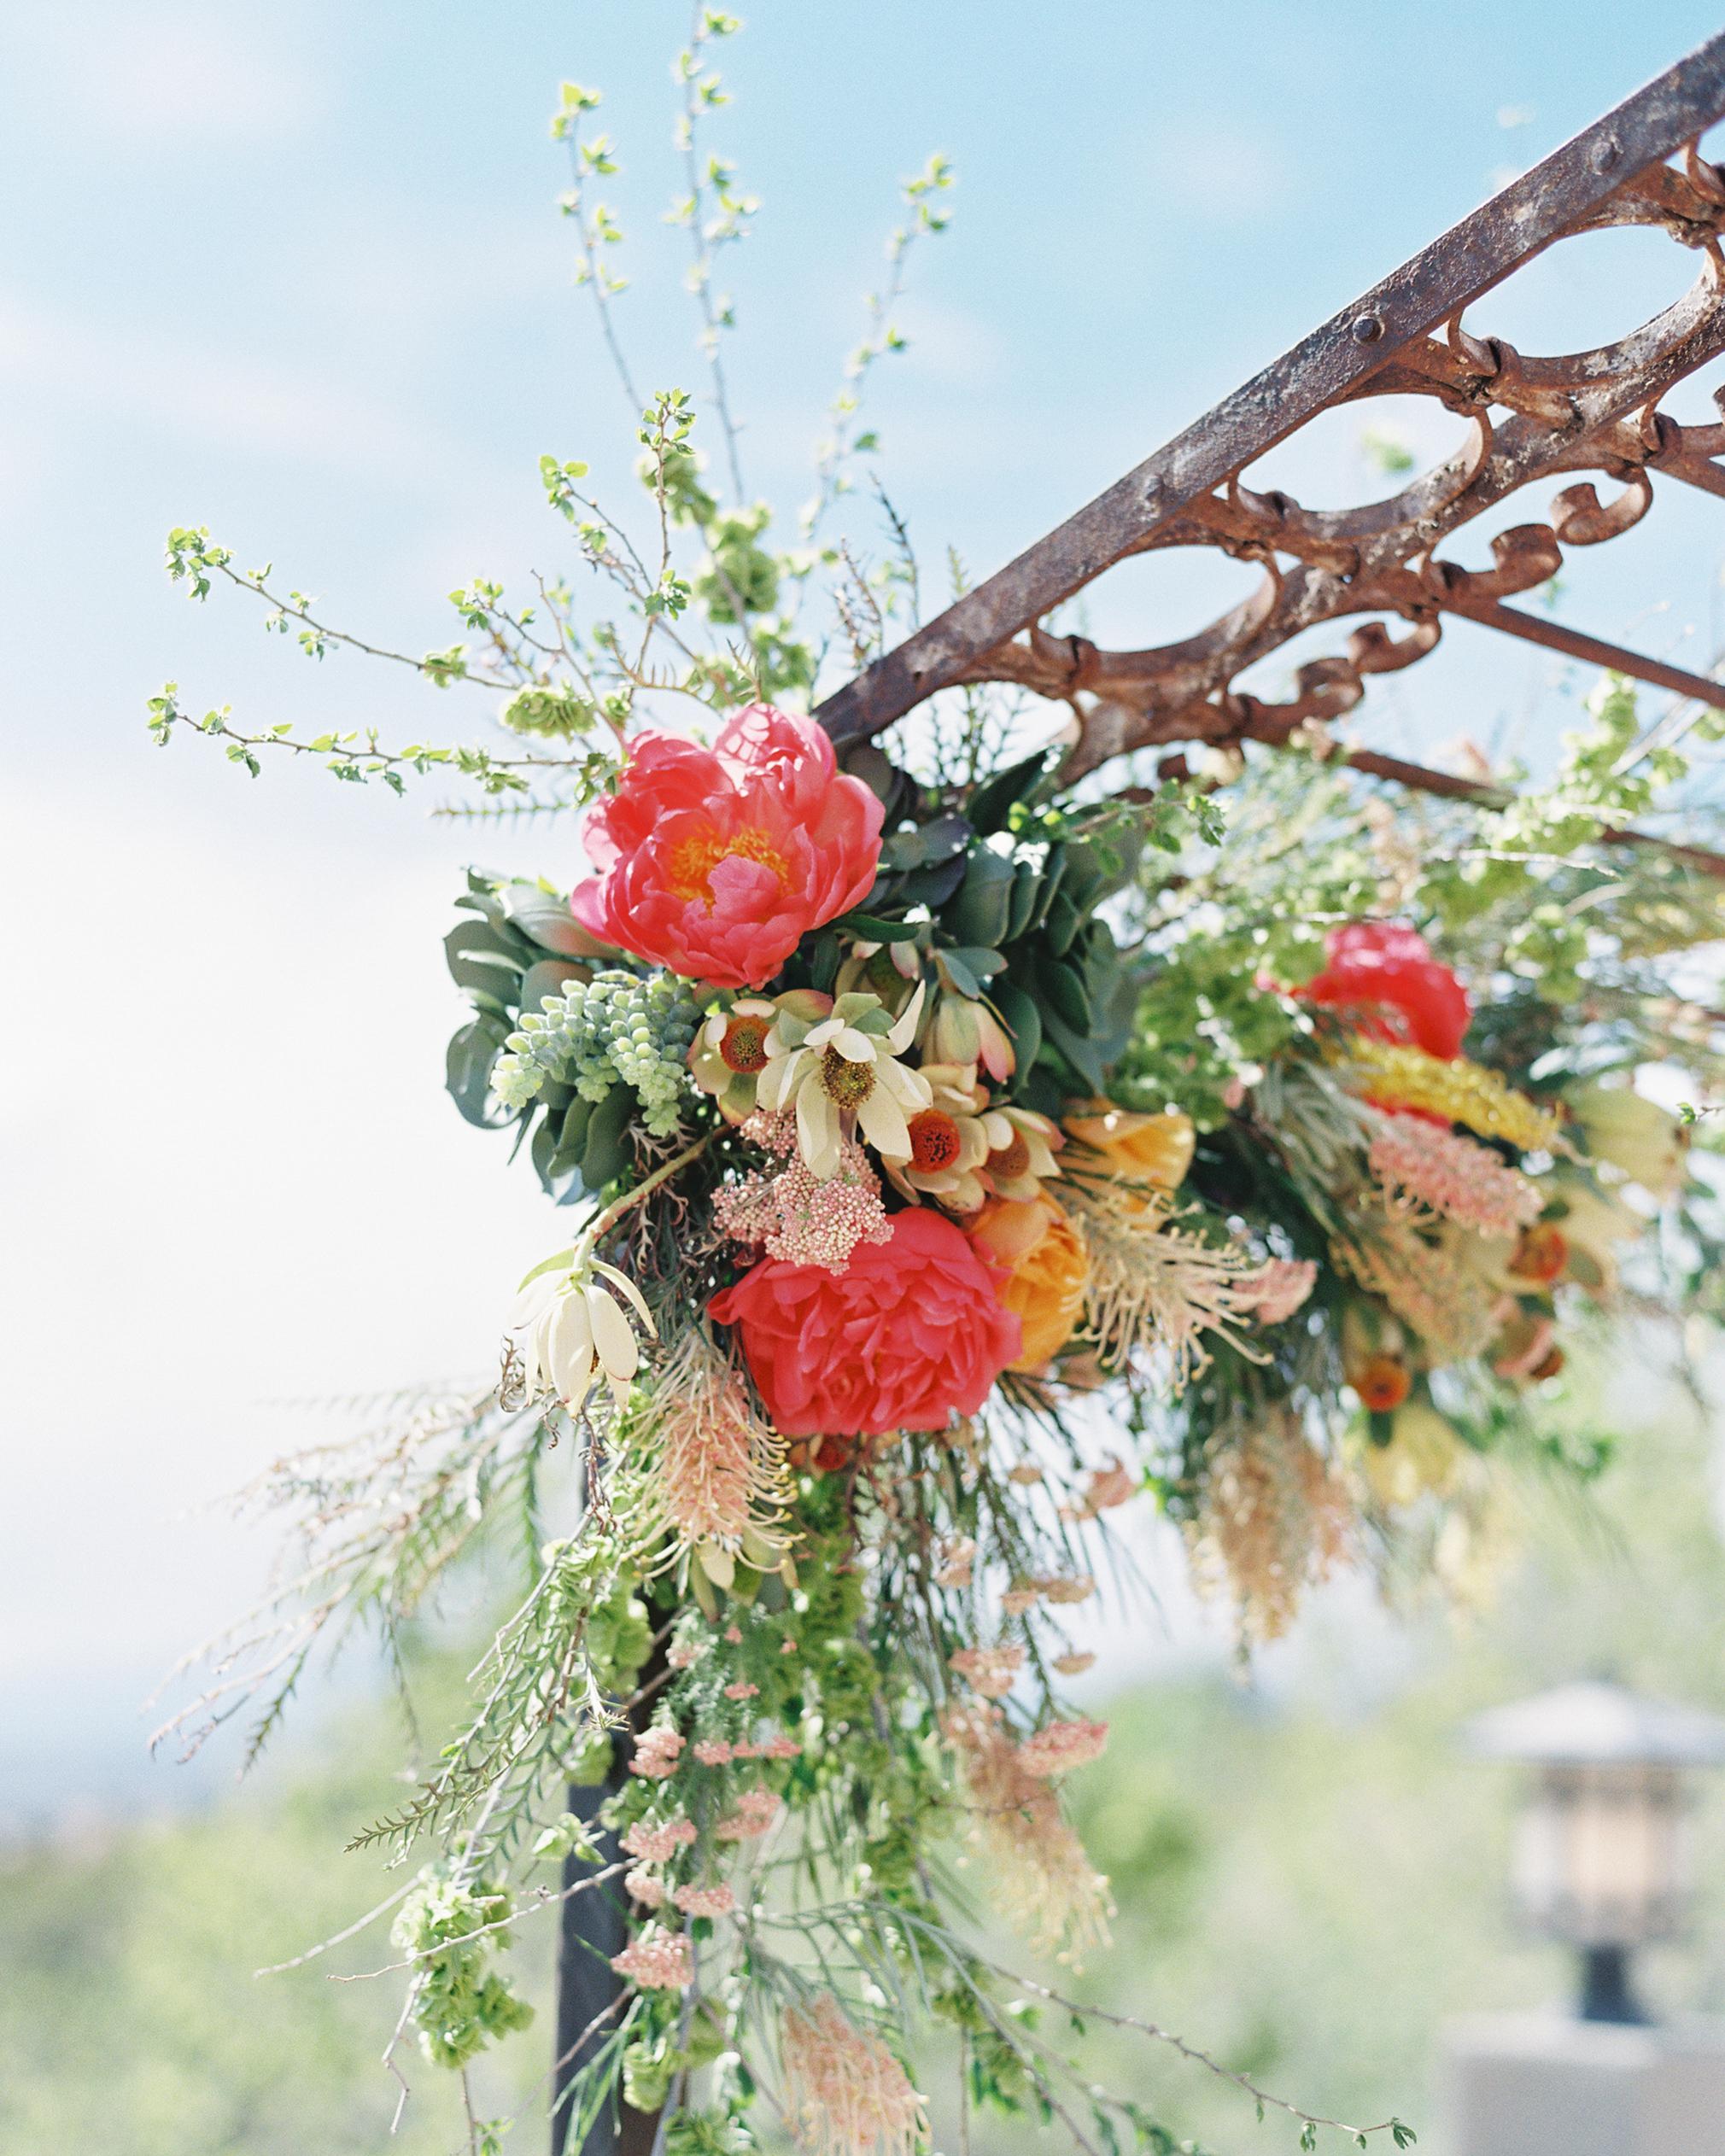 katherine-jared-wedding-0520-ds111387.jpg